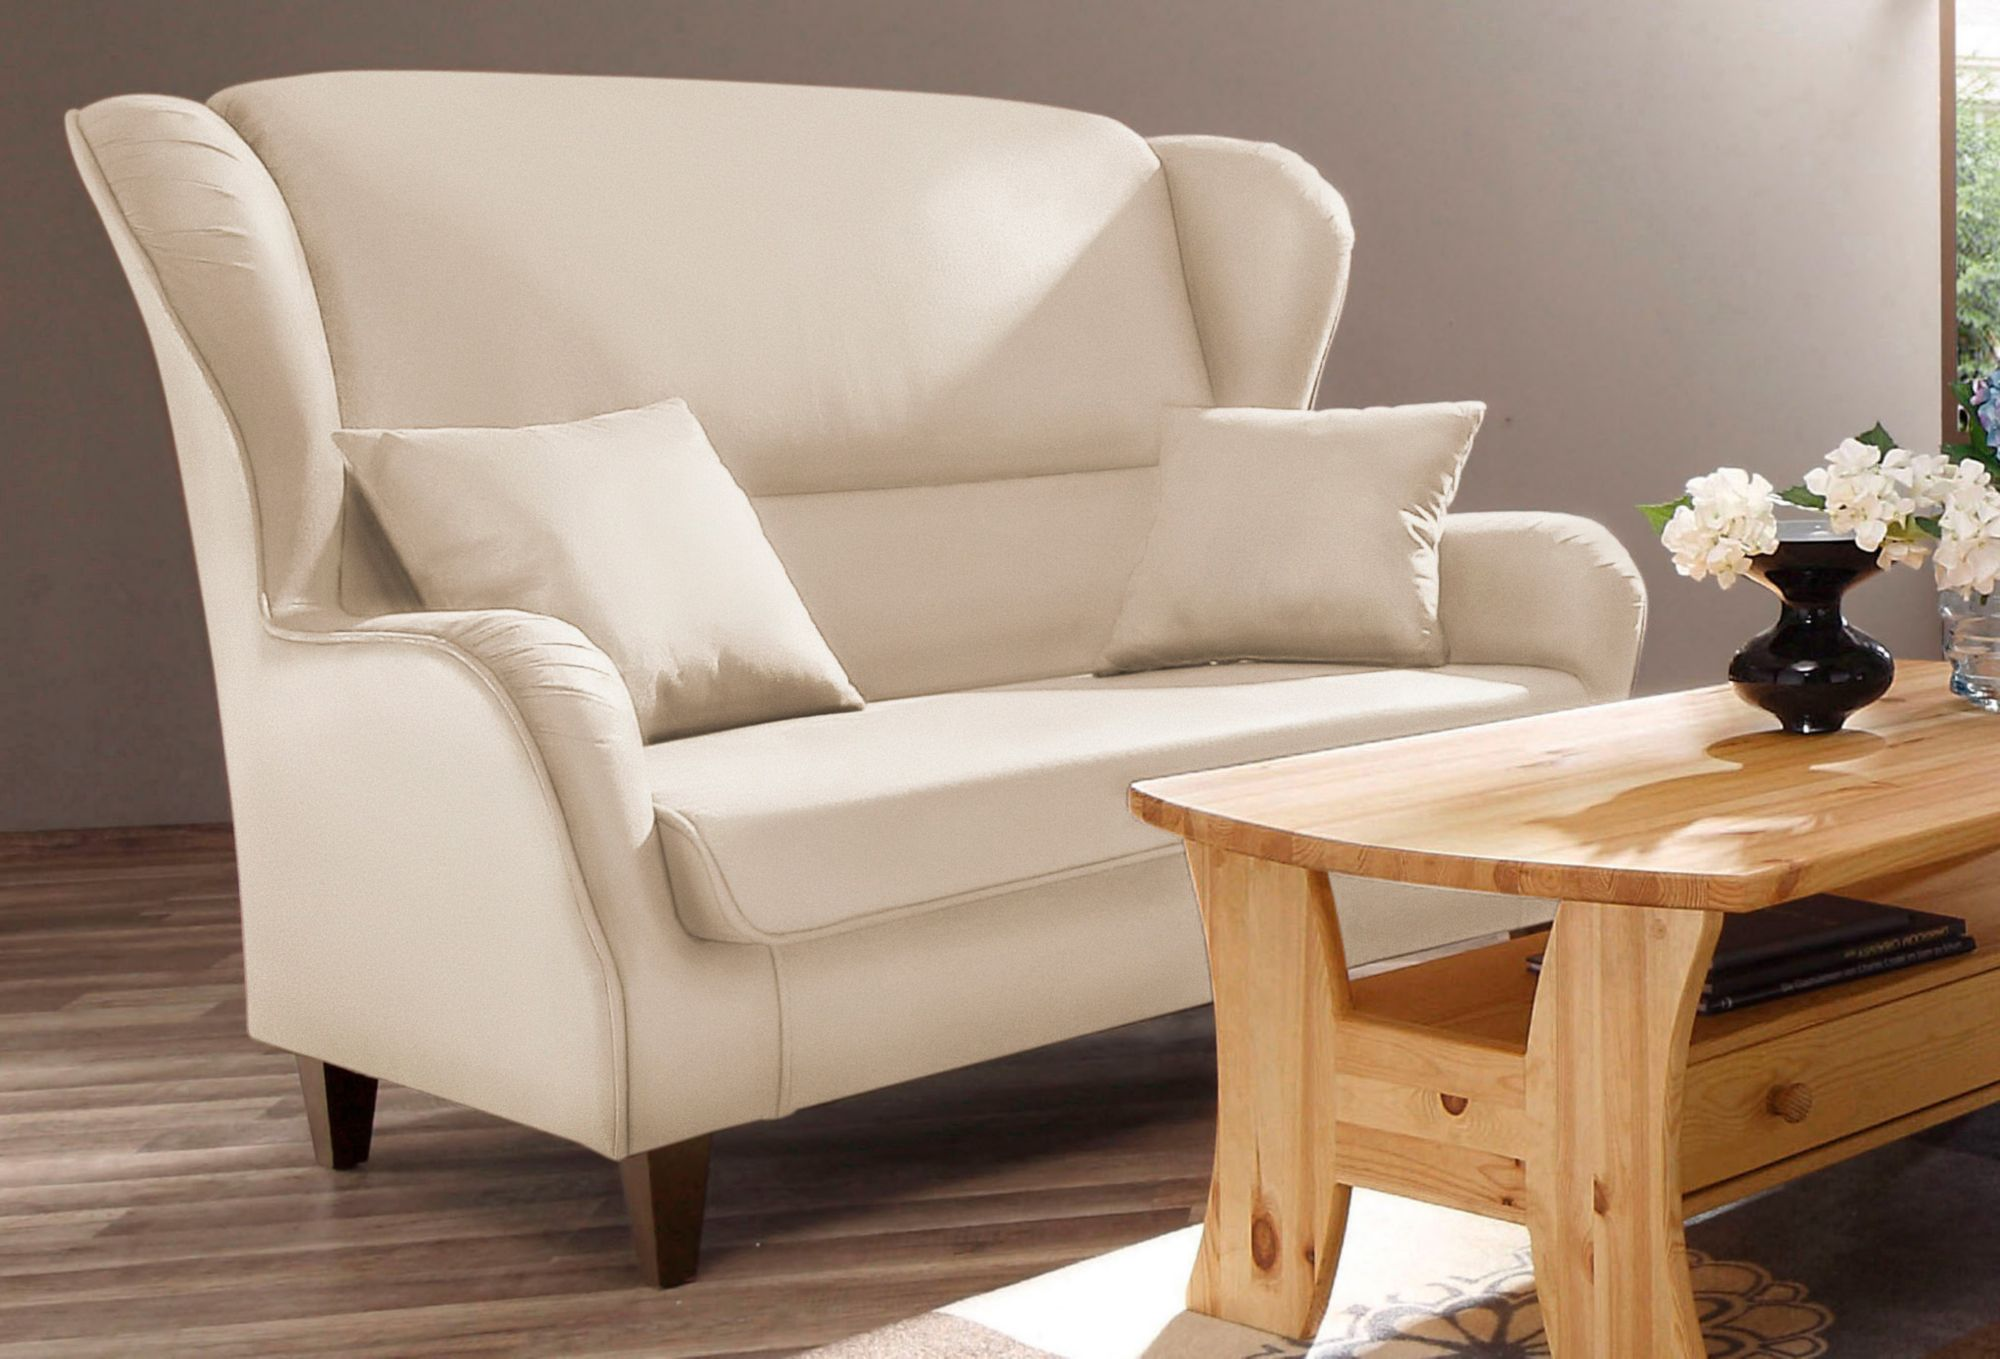 home affaire sofa nicola 2 sitzig schwab versand sofas. Black Bedroom Furniture Sets. Home Design Ideas